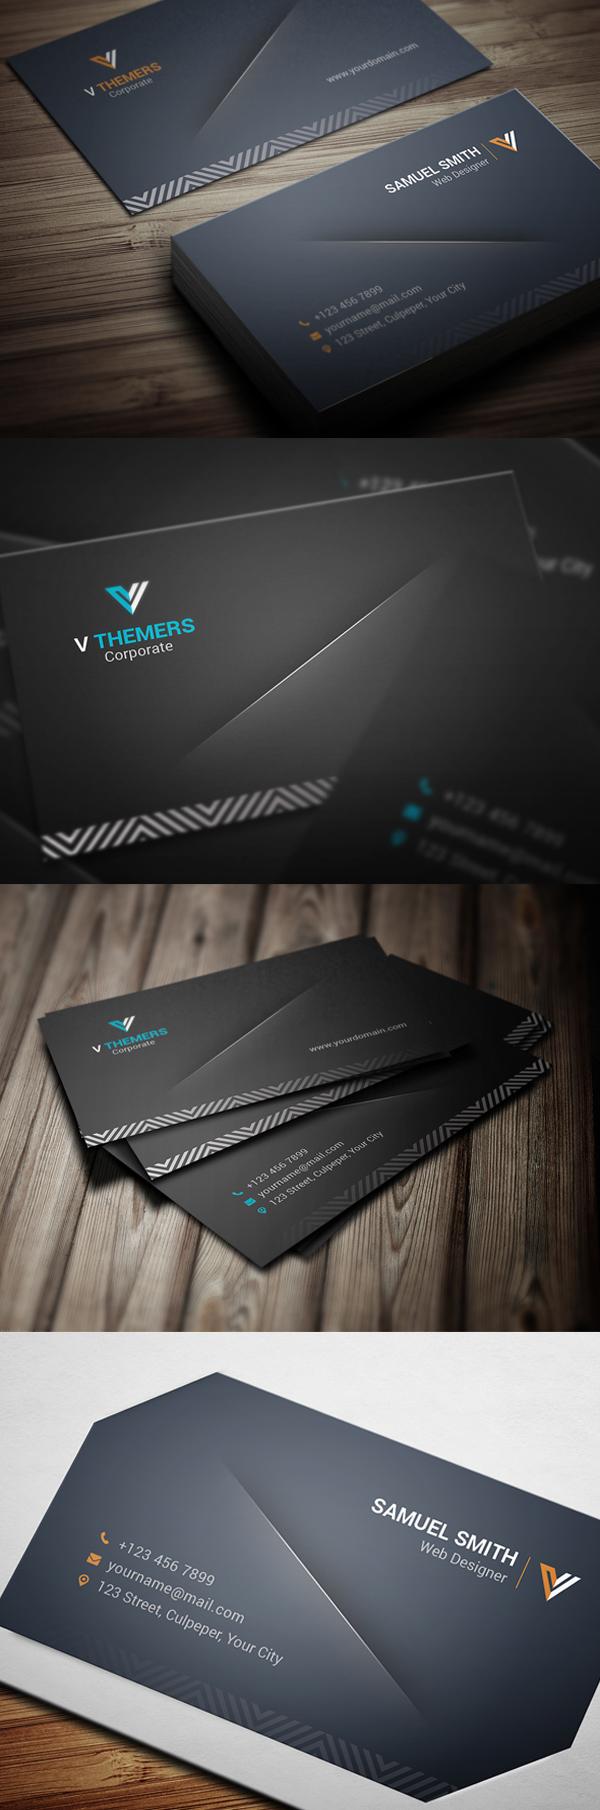 02 Business Card Design